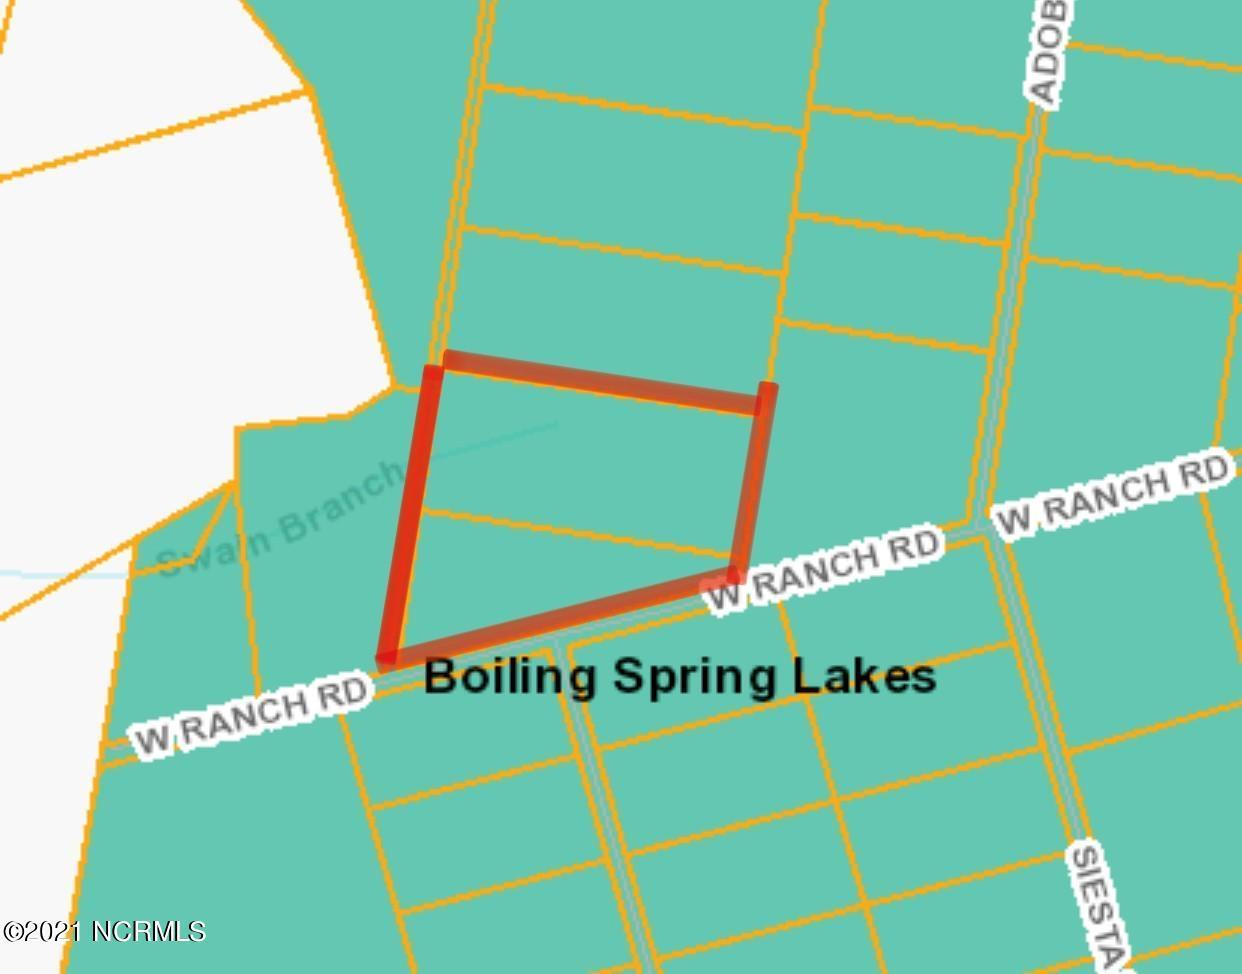 Tr-6 & 5 Ac Bsl Plat G/111 Boiling Spring Lakes, NC 28461